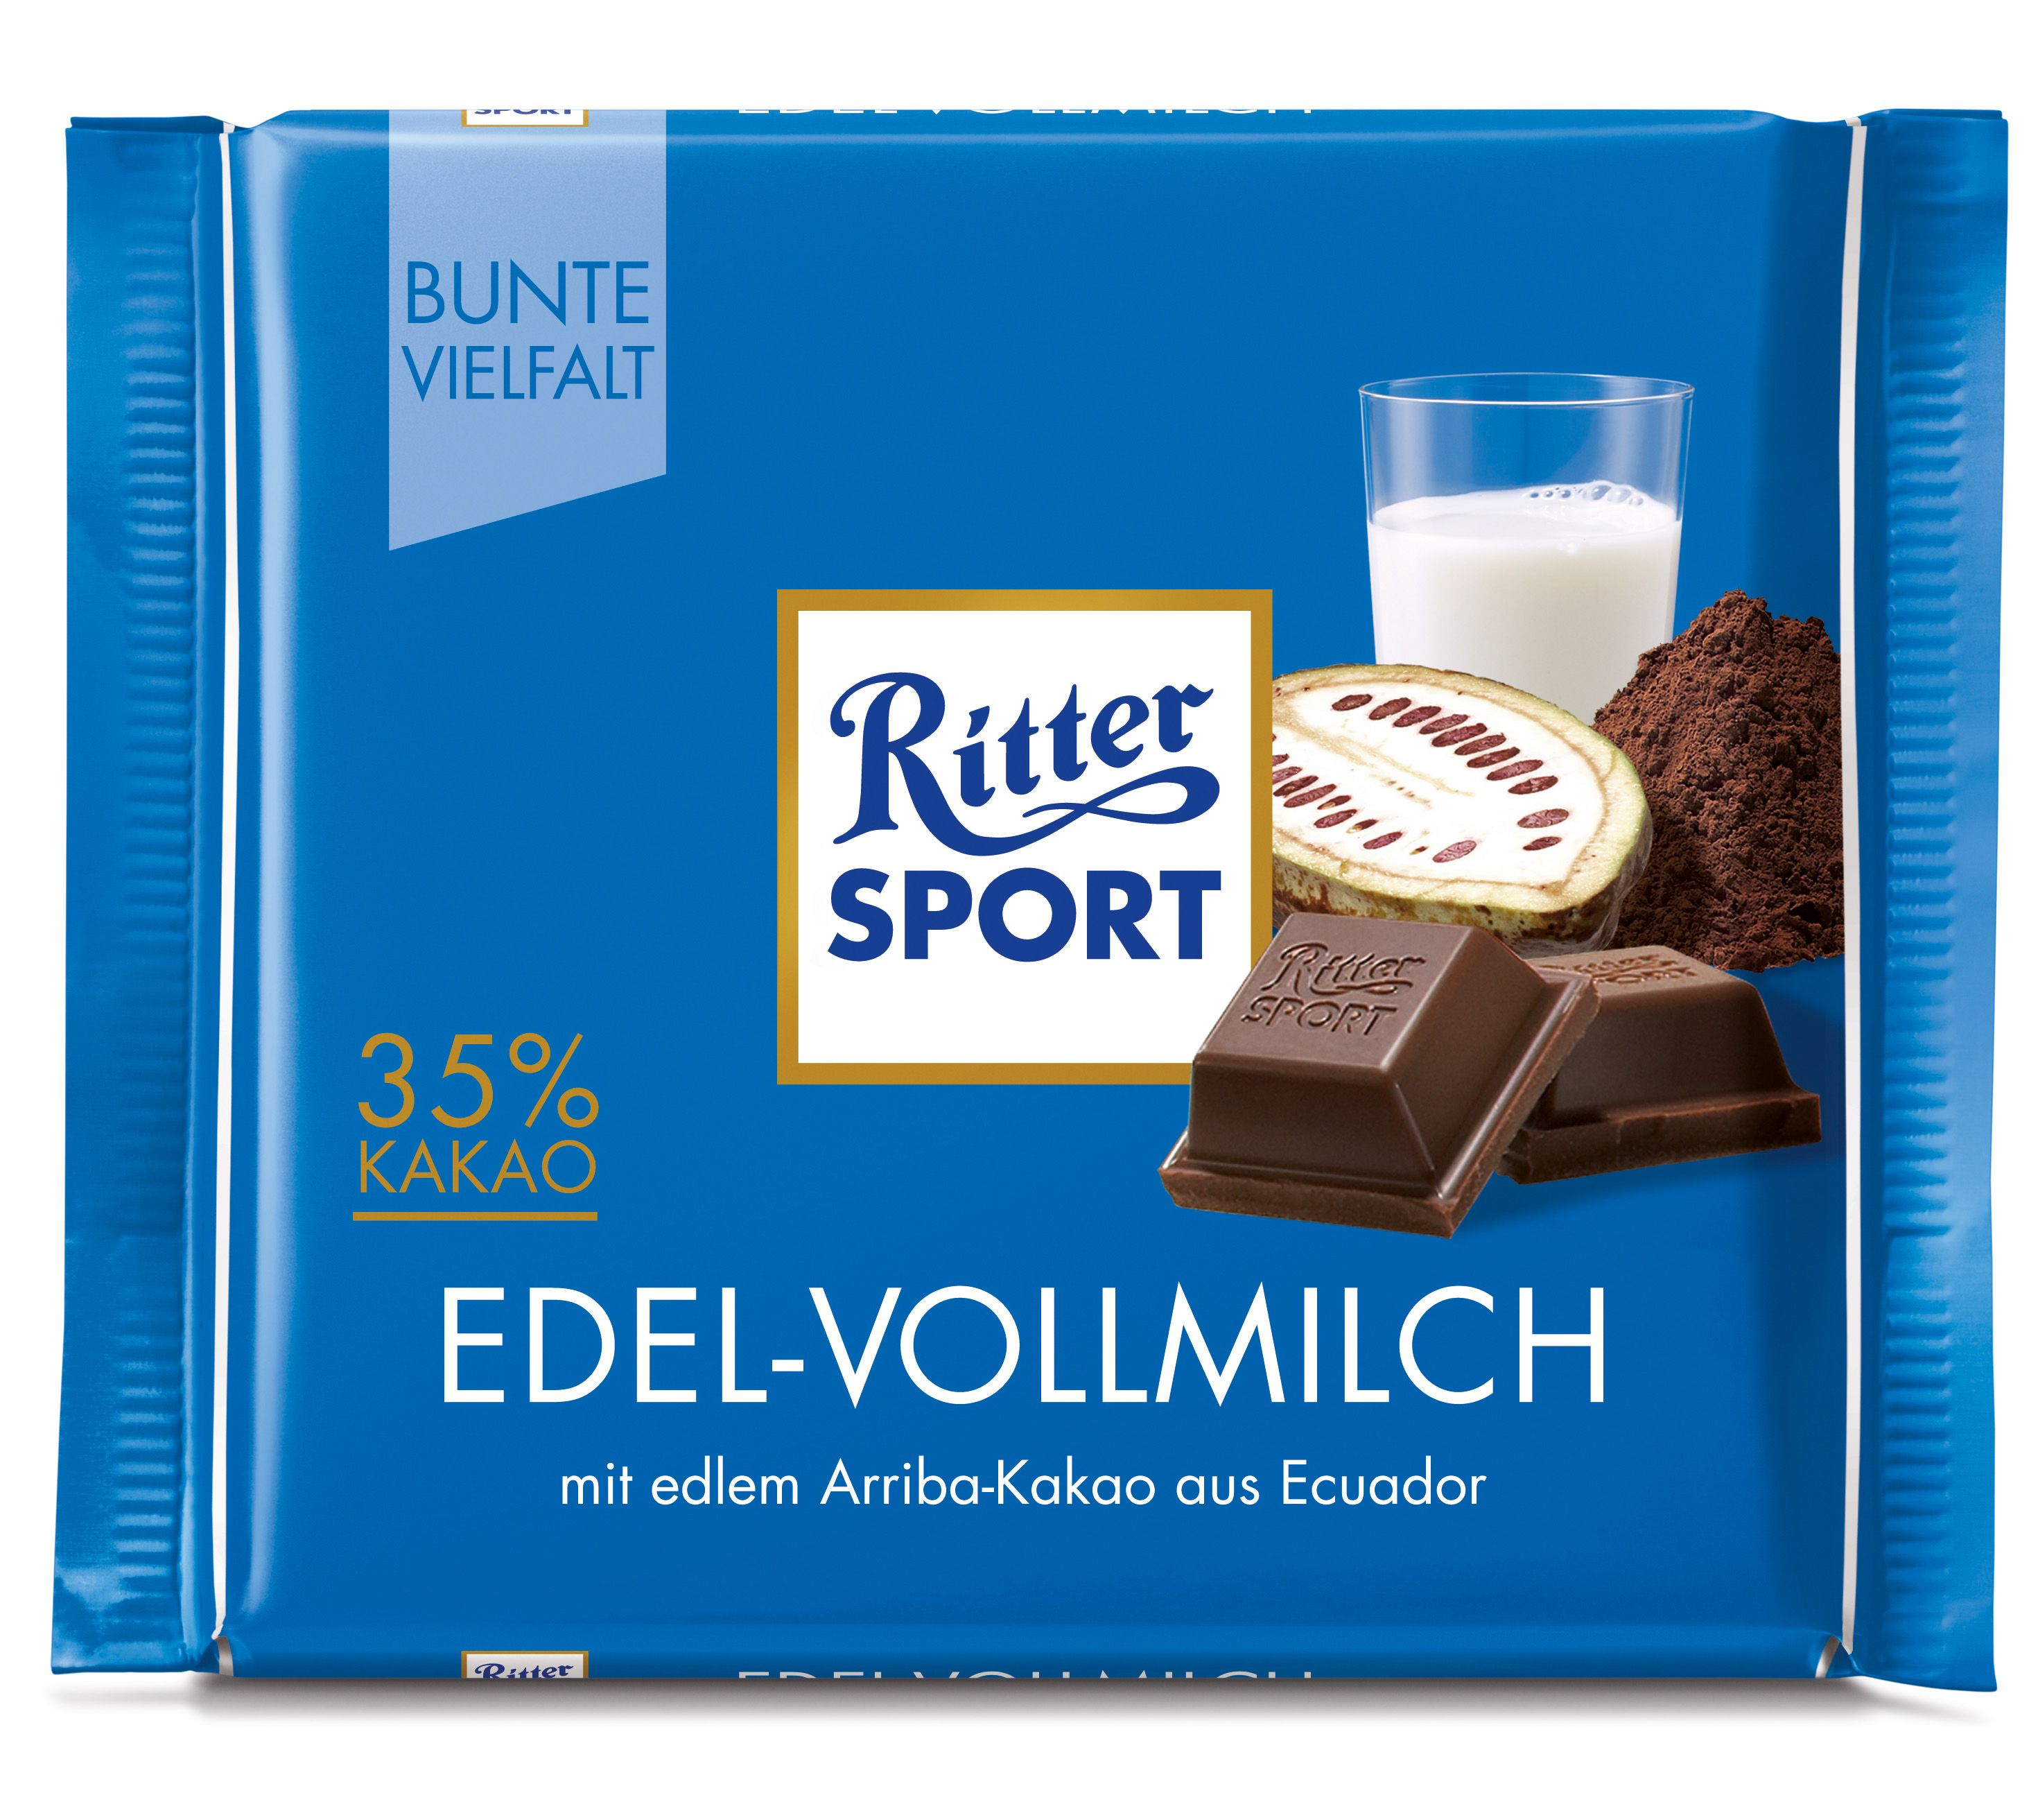 RITTER SPORT EdelVollmilch Ritter sport, Sport und Edel